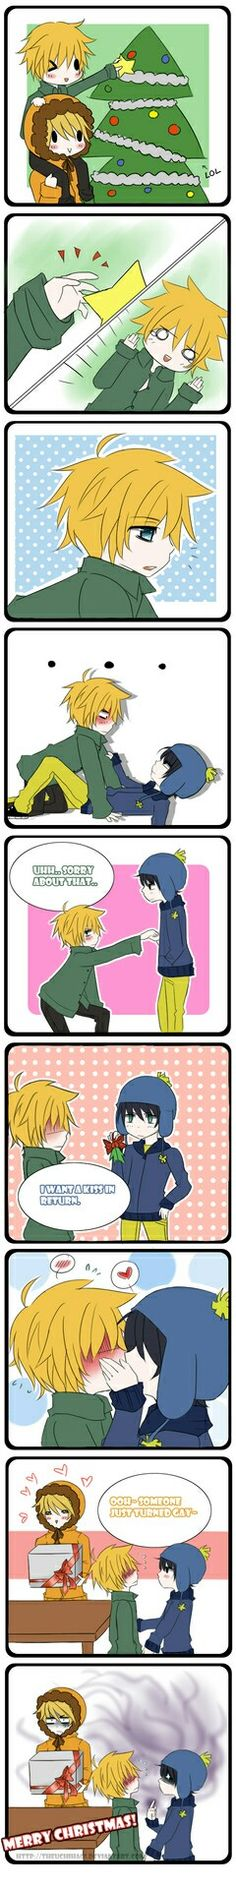 Tweek x craig southpark anime